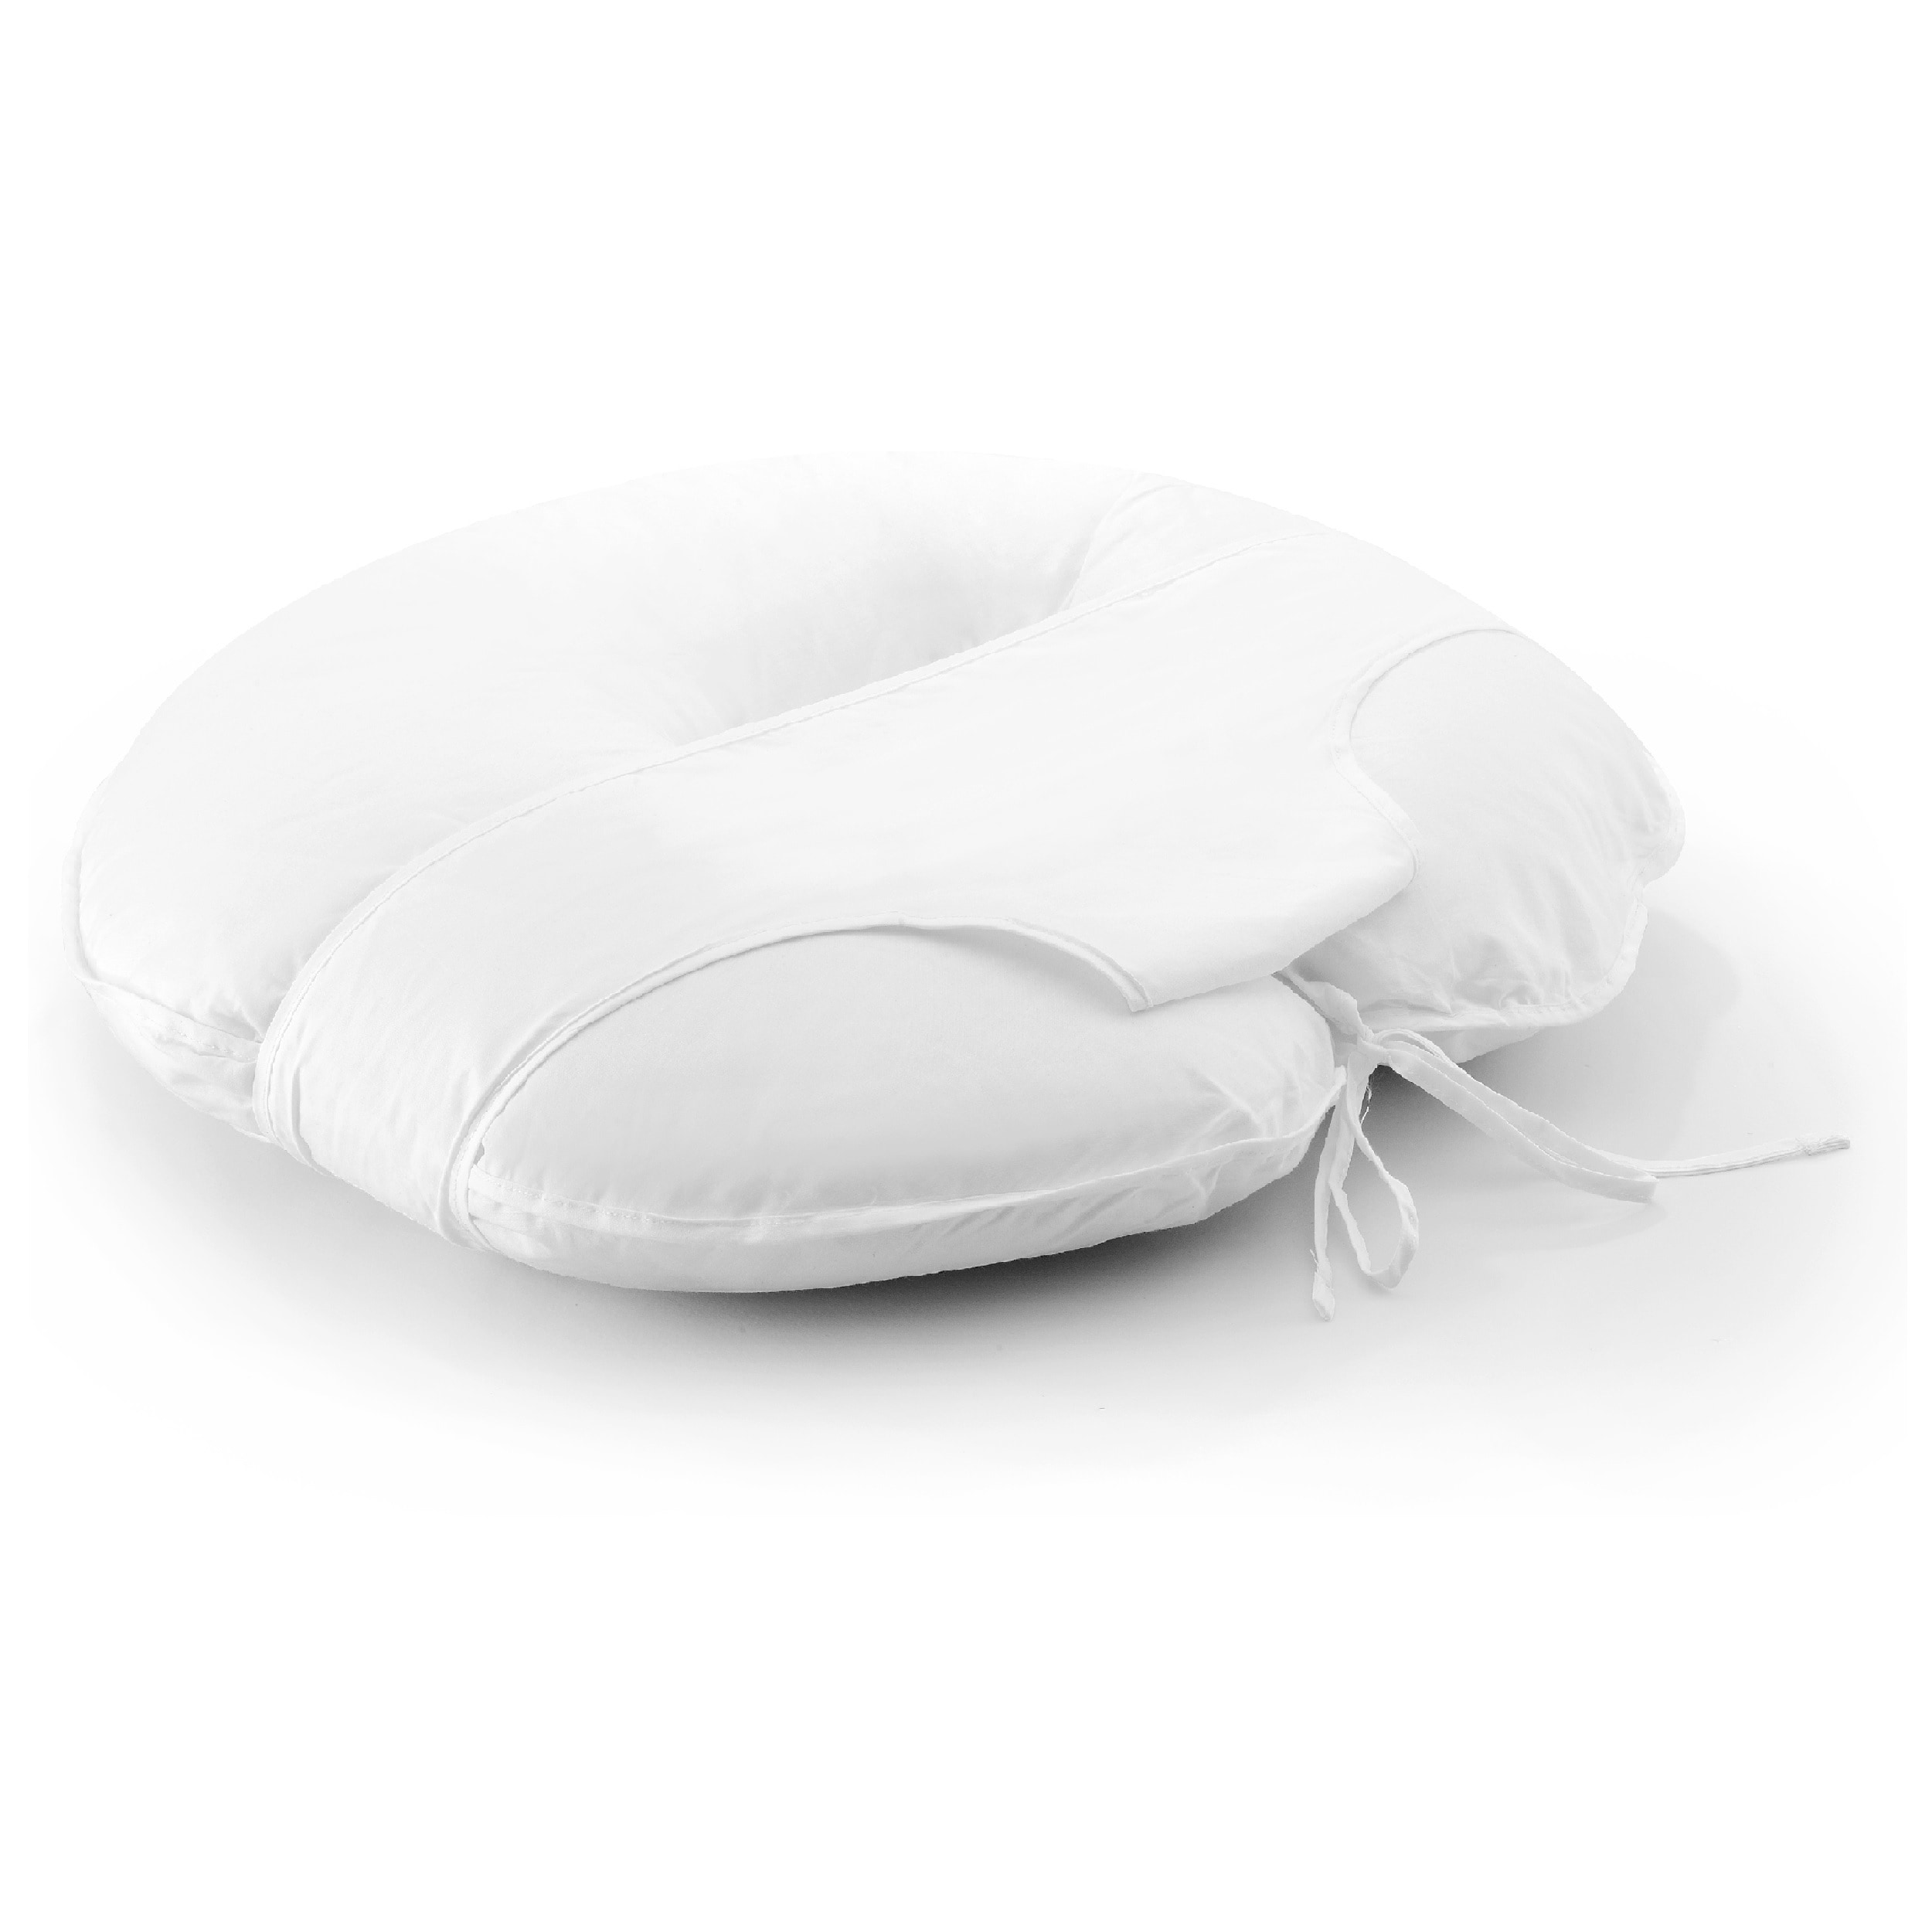 therapedic trucool side sleeper pillow diamond luxury queen standard size